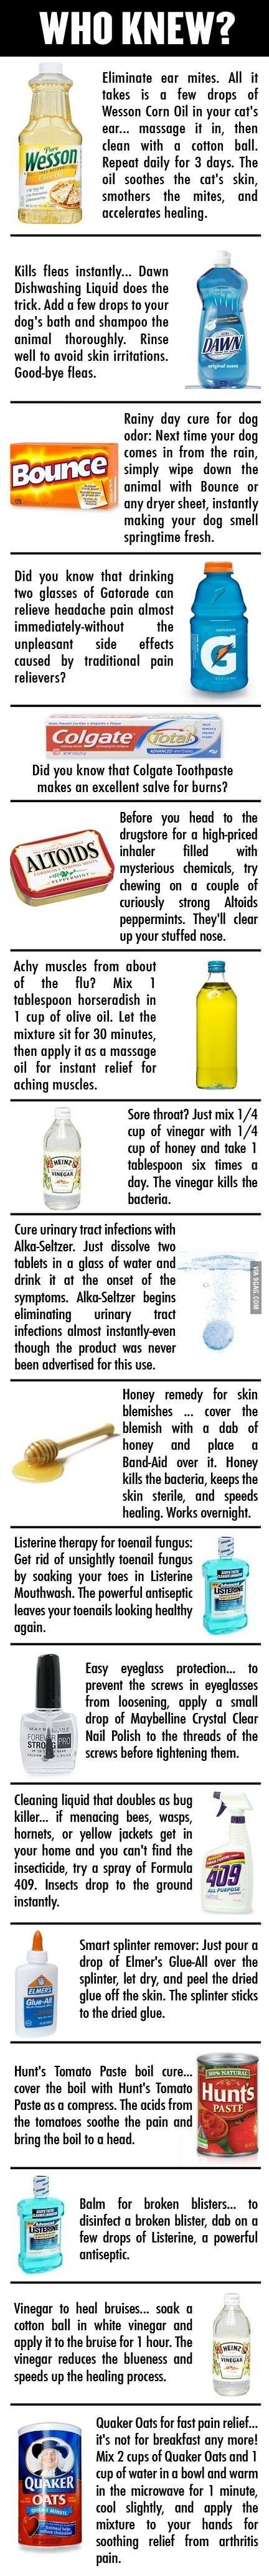 Just a few tips